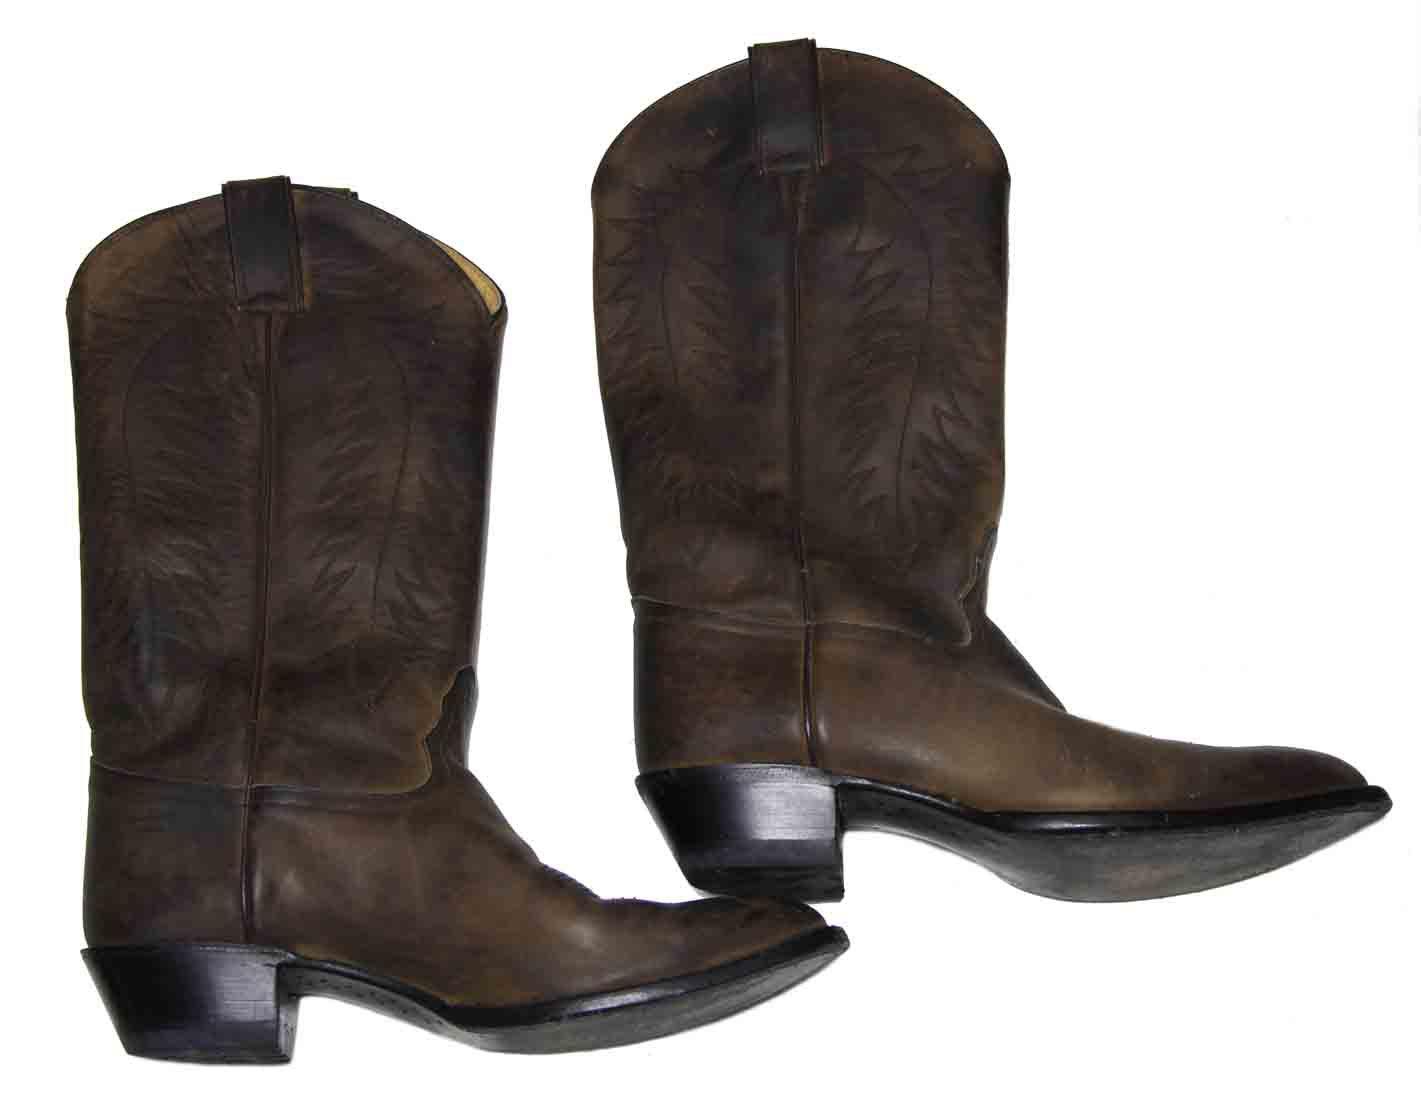 Vintage Tony Lama Cowboy Boots Leather Brown Men's Size 10B EXTRA NARROW